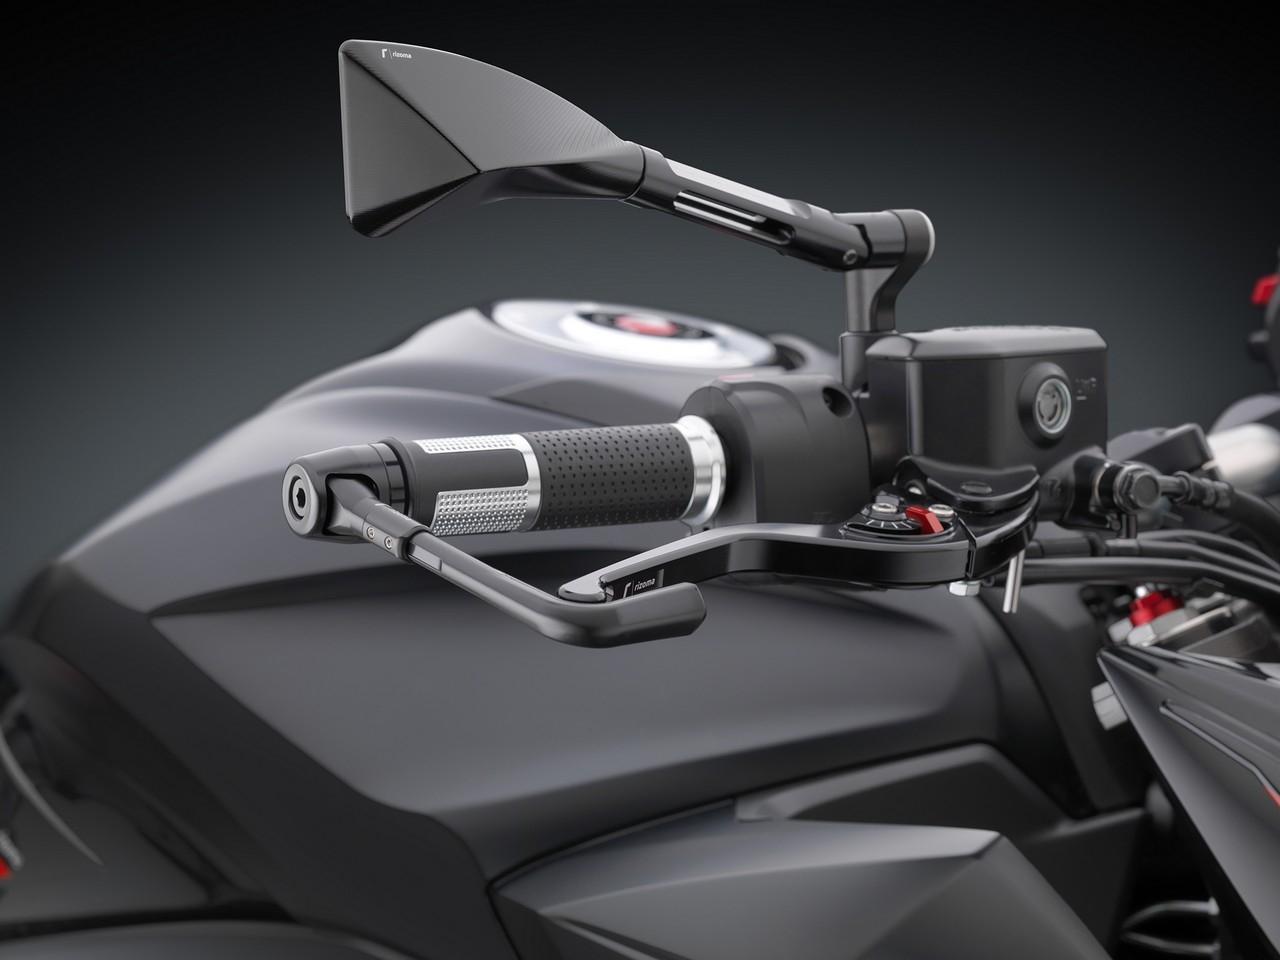 Kawasaki Z800 Rizoma